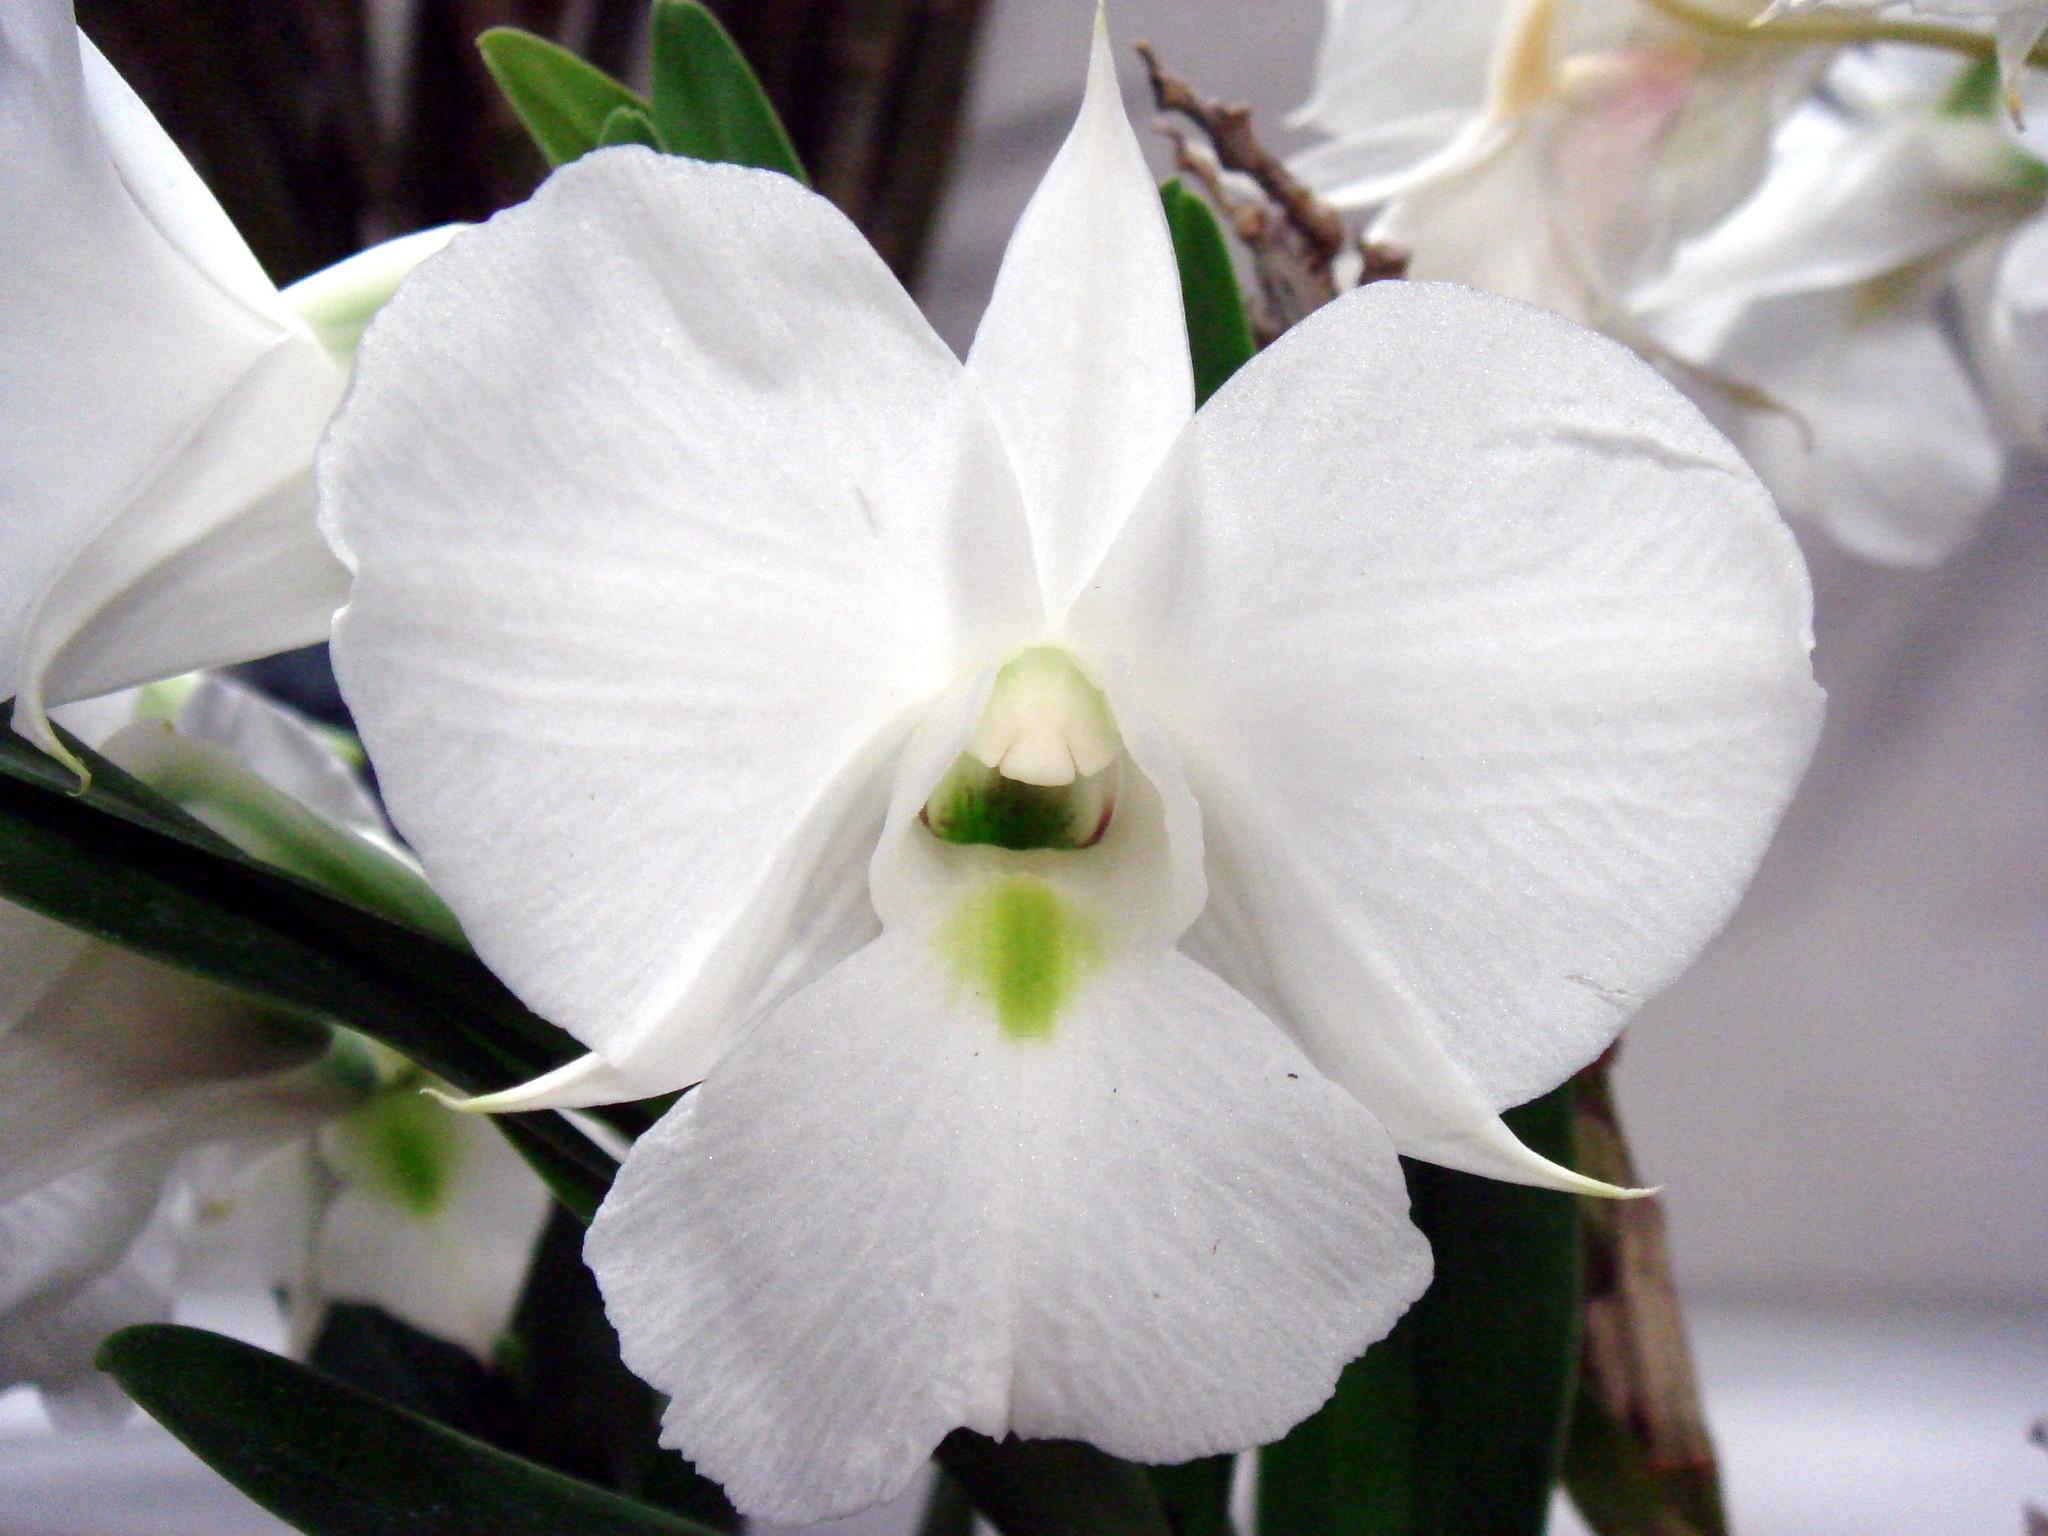 http://orchids.la.coocan.jp/Dendrobium/Dendrobium%20schuetzei/DSC06474.JPG